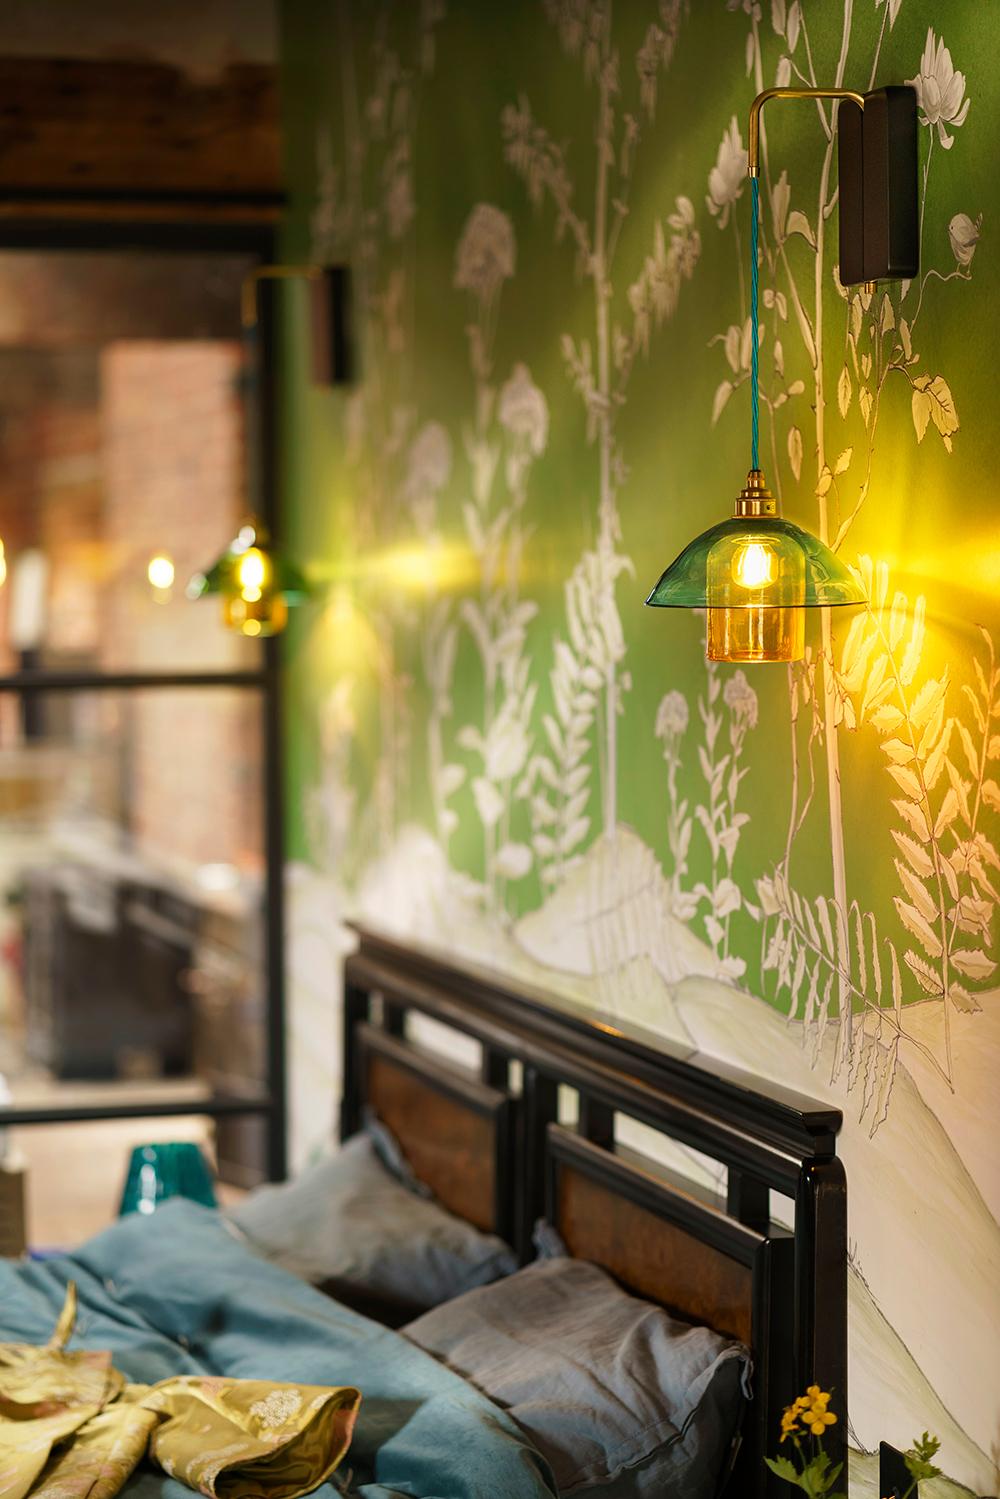 Glass-Lighting-bedroom-light-GALLERY-Japonica-002.jpg